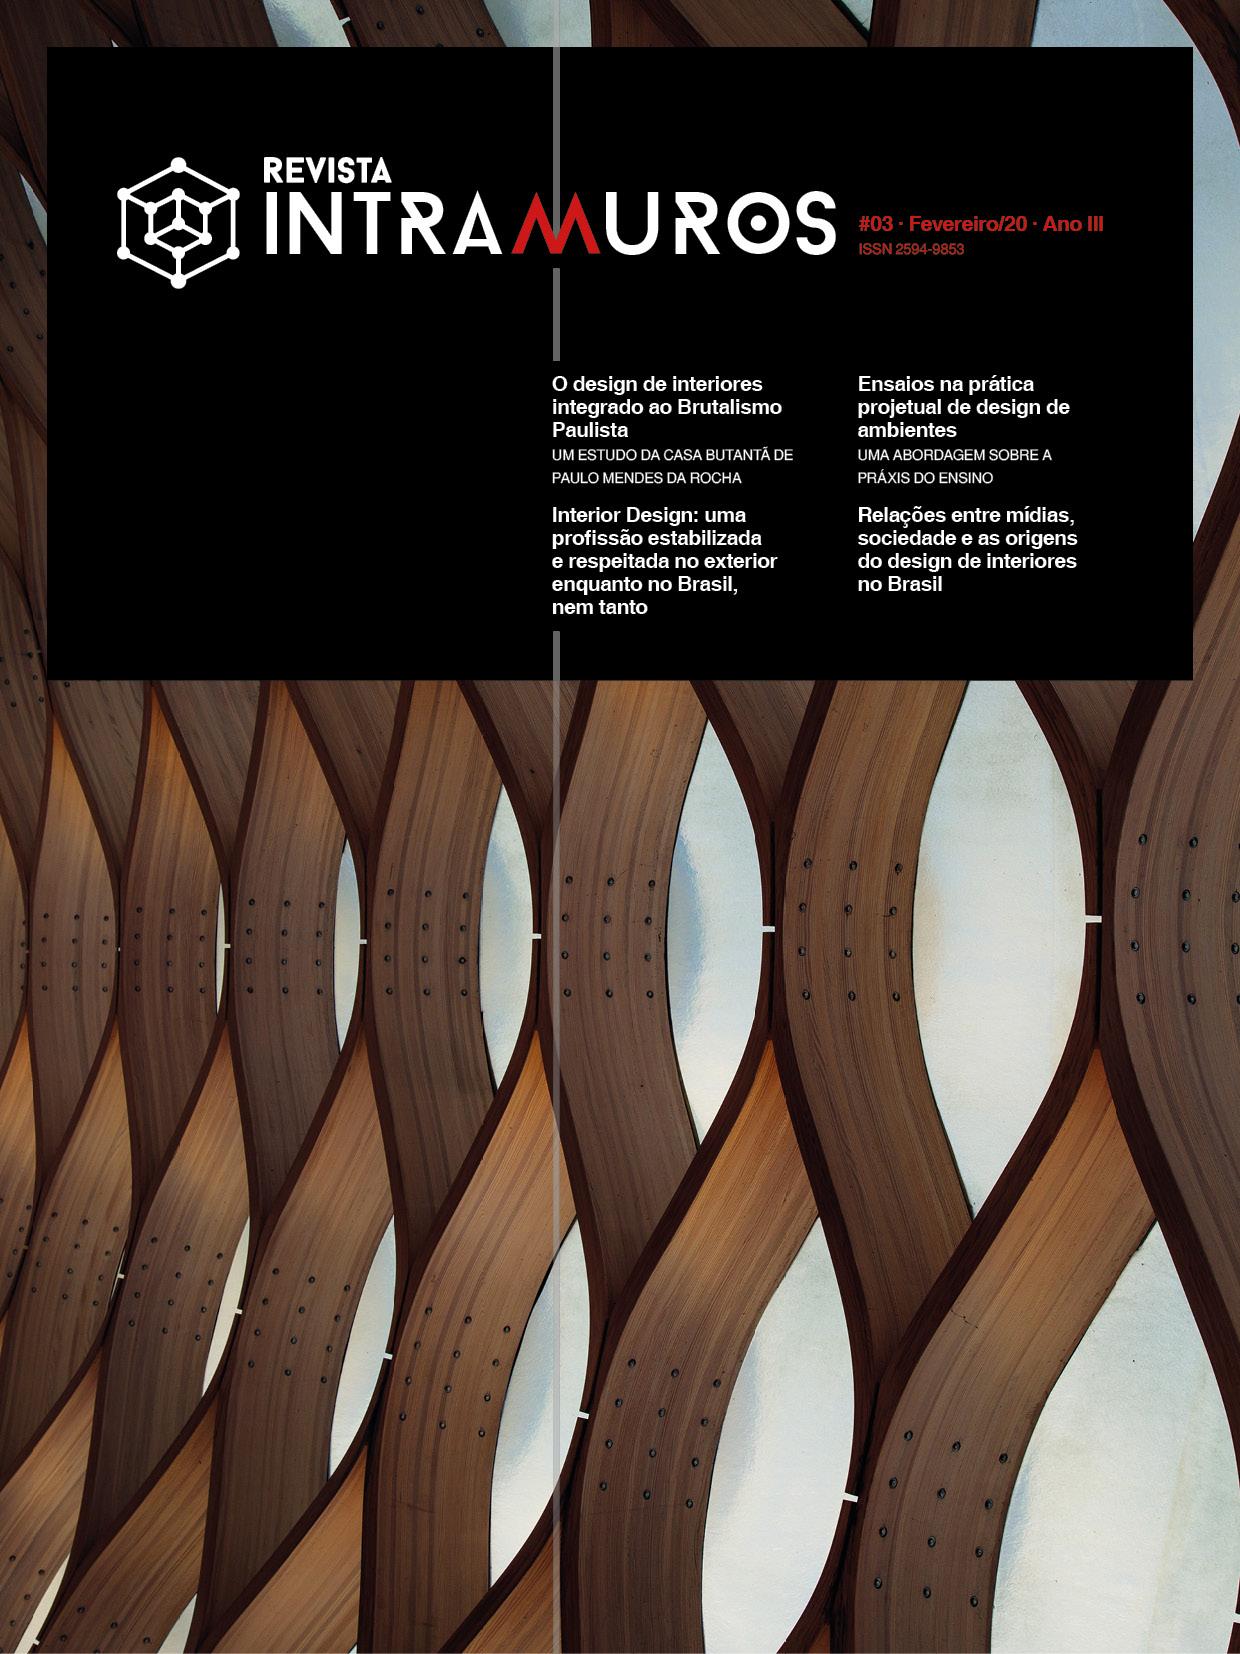 ANO 3 Nº 3 - Fevereiro/2020 - ISSN 2594-9853 | edicao-03